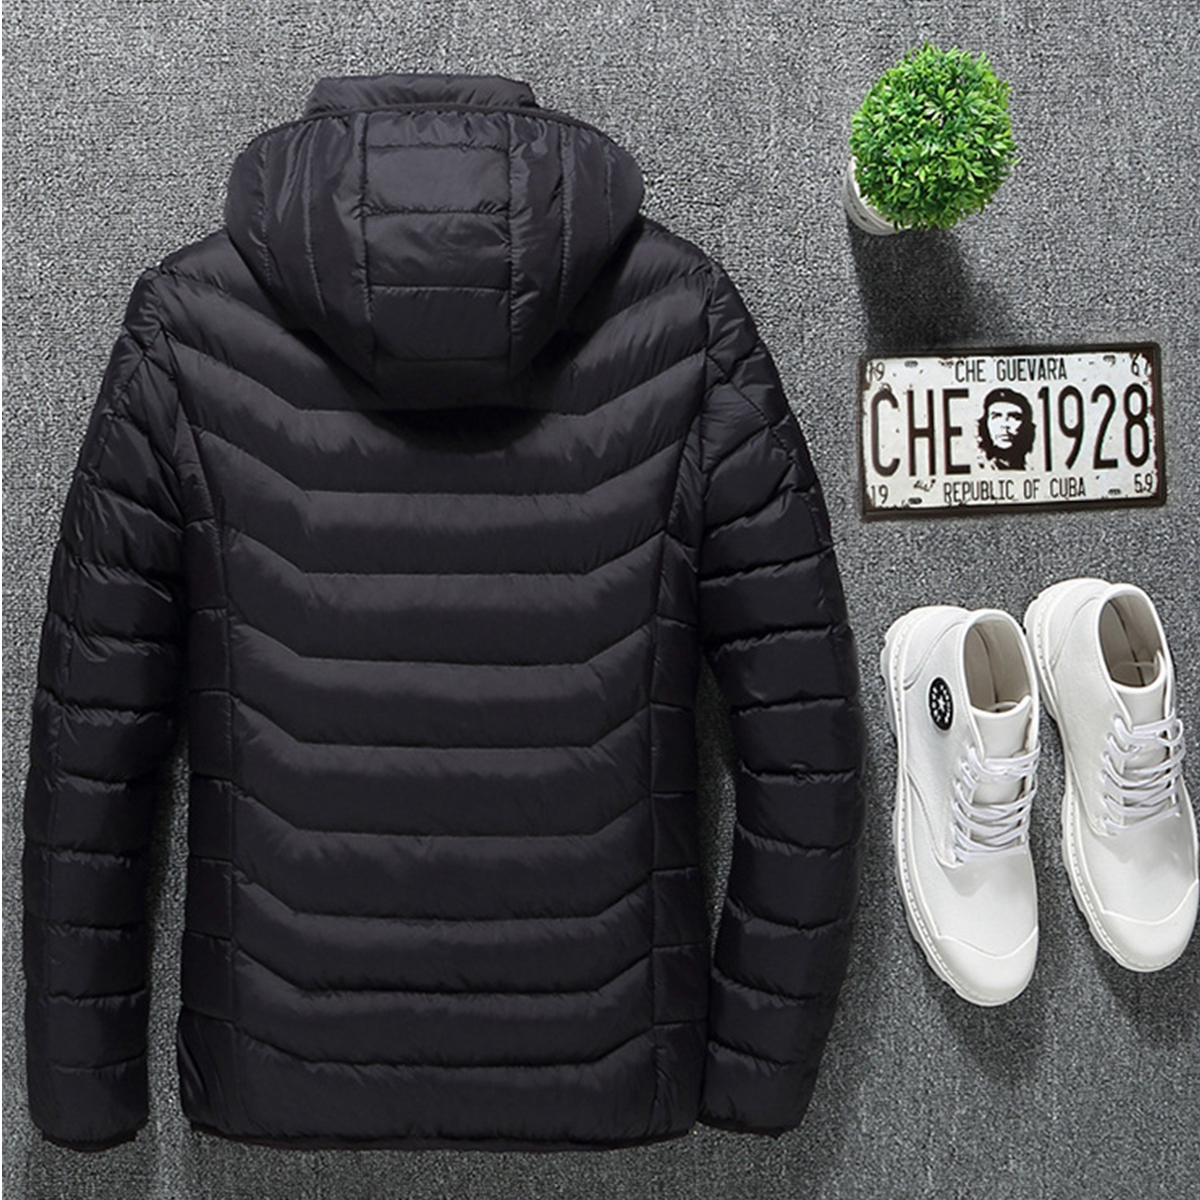 26cda6e354d Mens Women USB Heated Warm Back Hand Wrist Hooded Winter Jacket ...